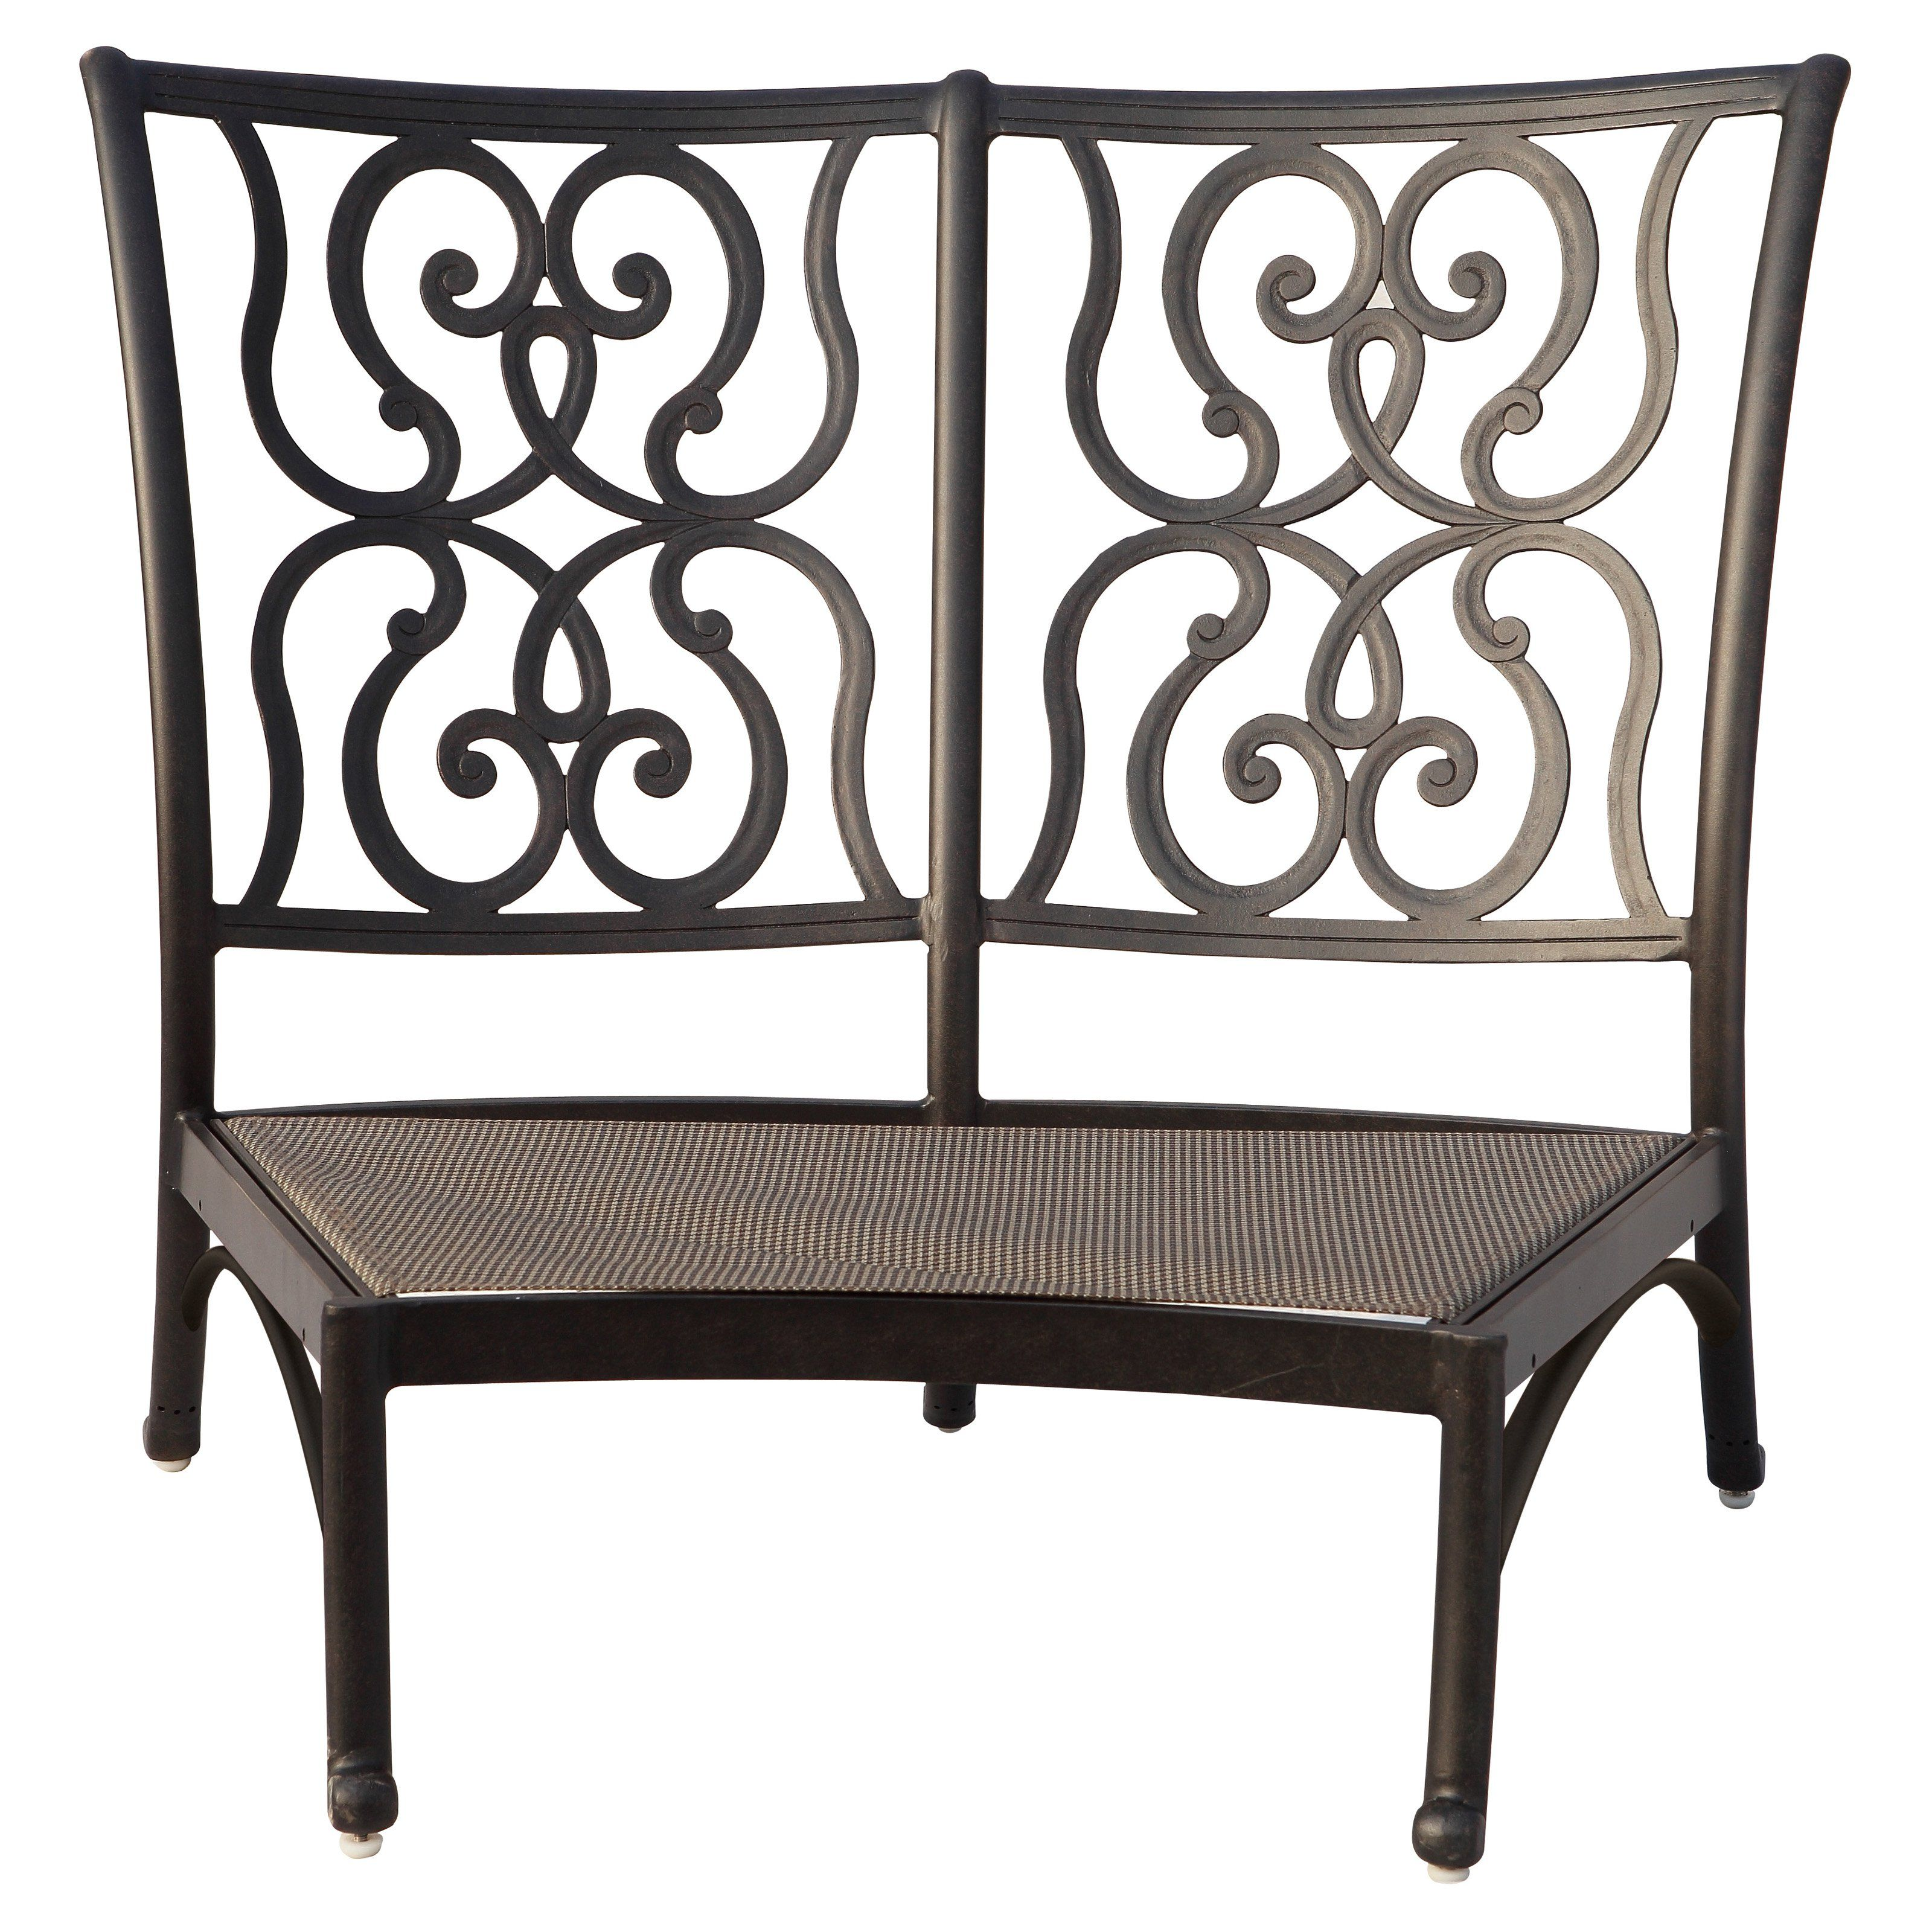 Outdoor Darlee Santa Anita Crescent Center Sectional Armless Patio Chair    301125 2/102